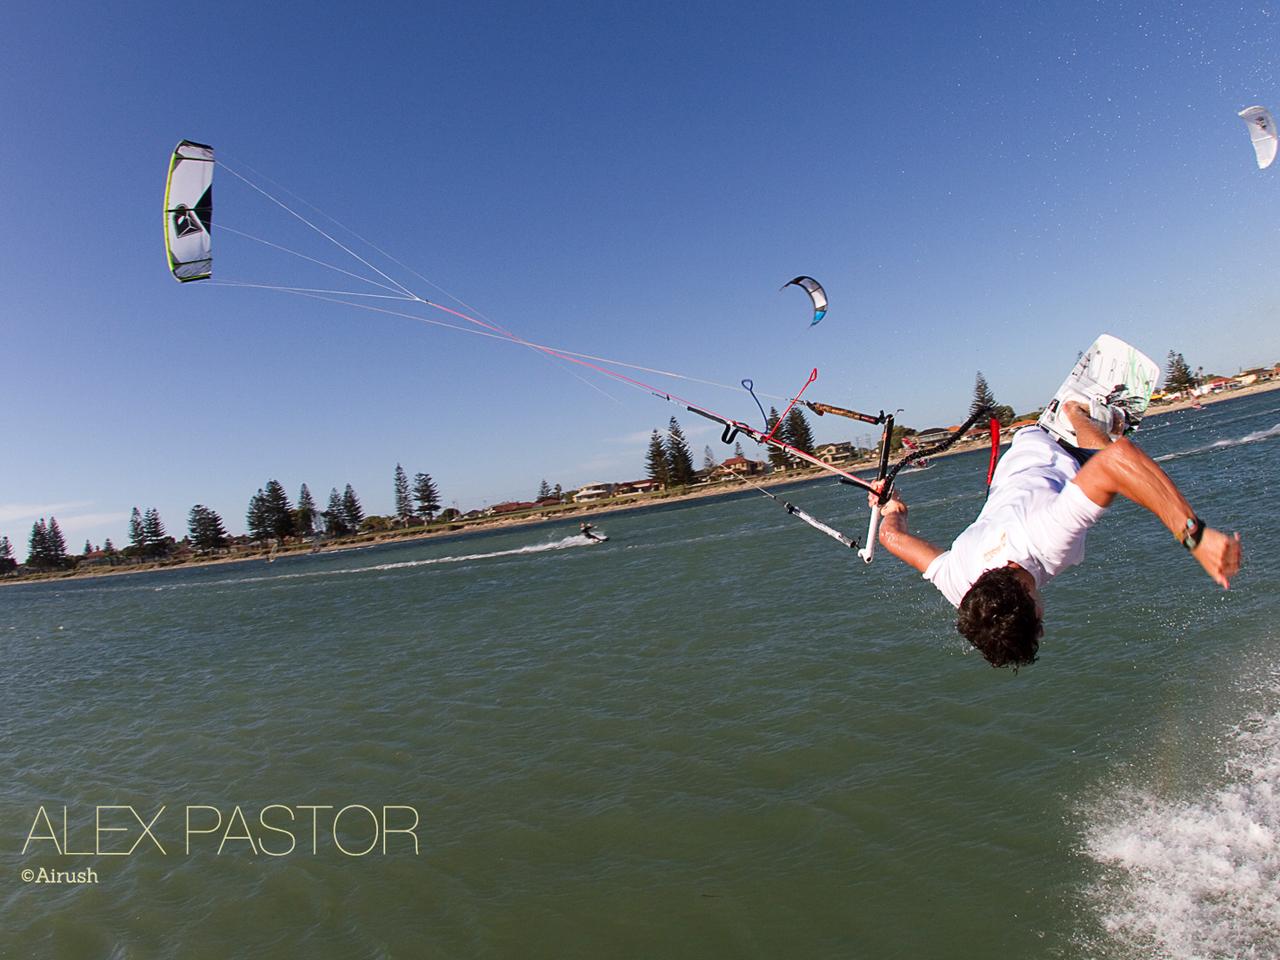 kitesurf wallpaper image - Alex Pastor with a low handlepass - in resolution: Standard 4:3 1280 X 960